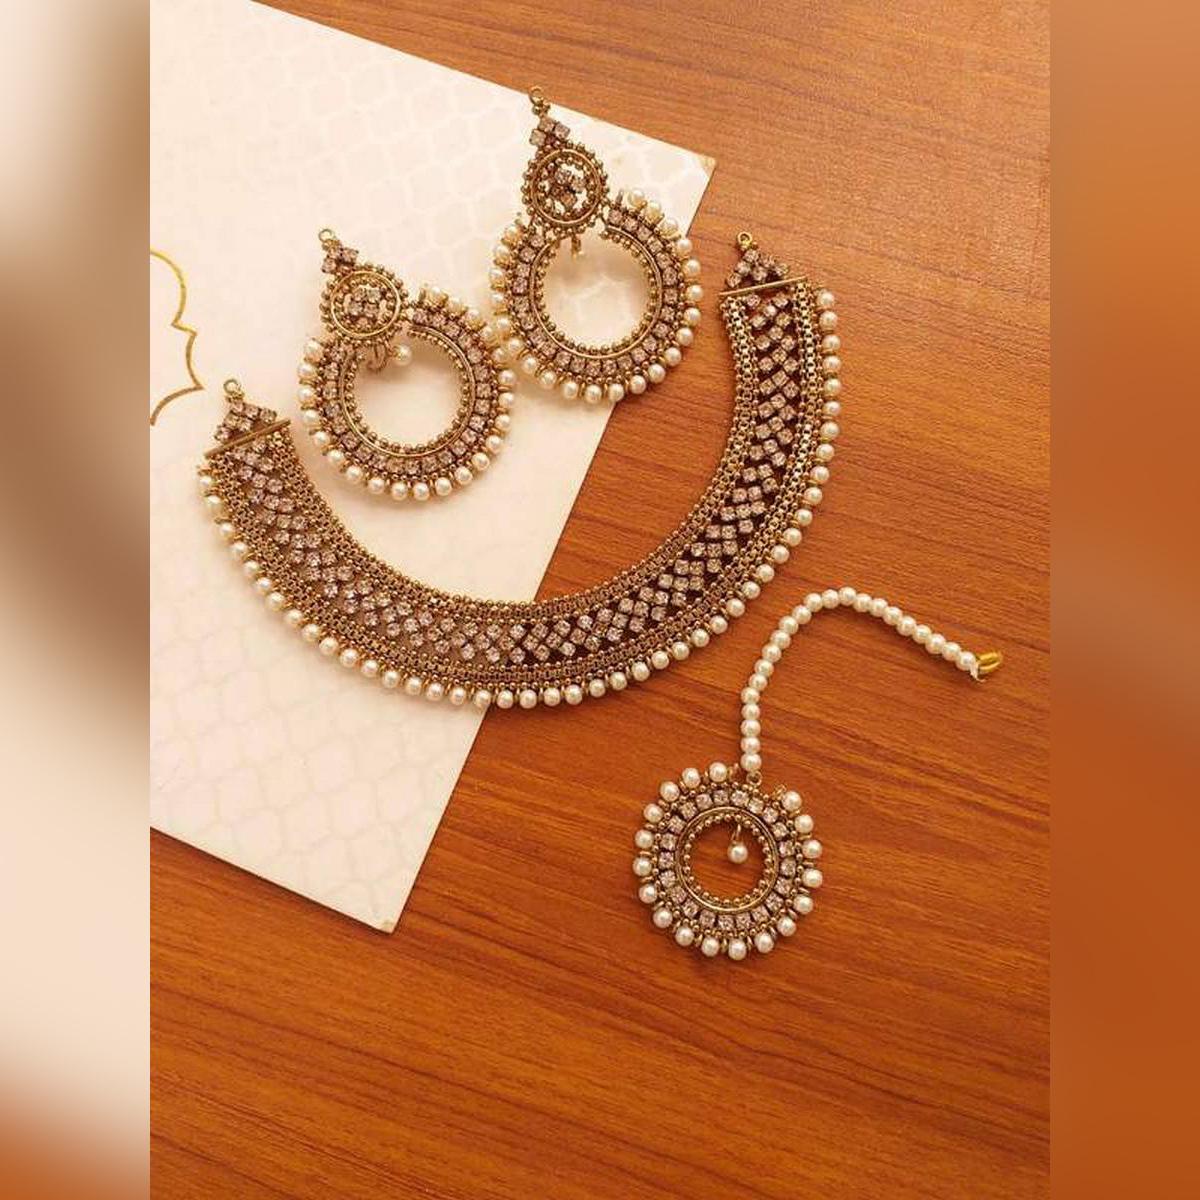 New fashionable stylish design long lasting polish for girls and woman